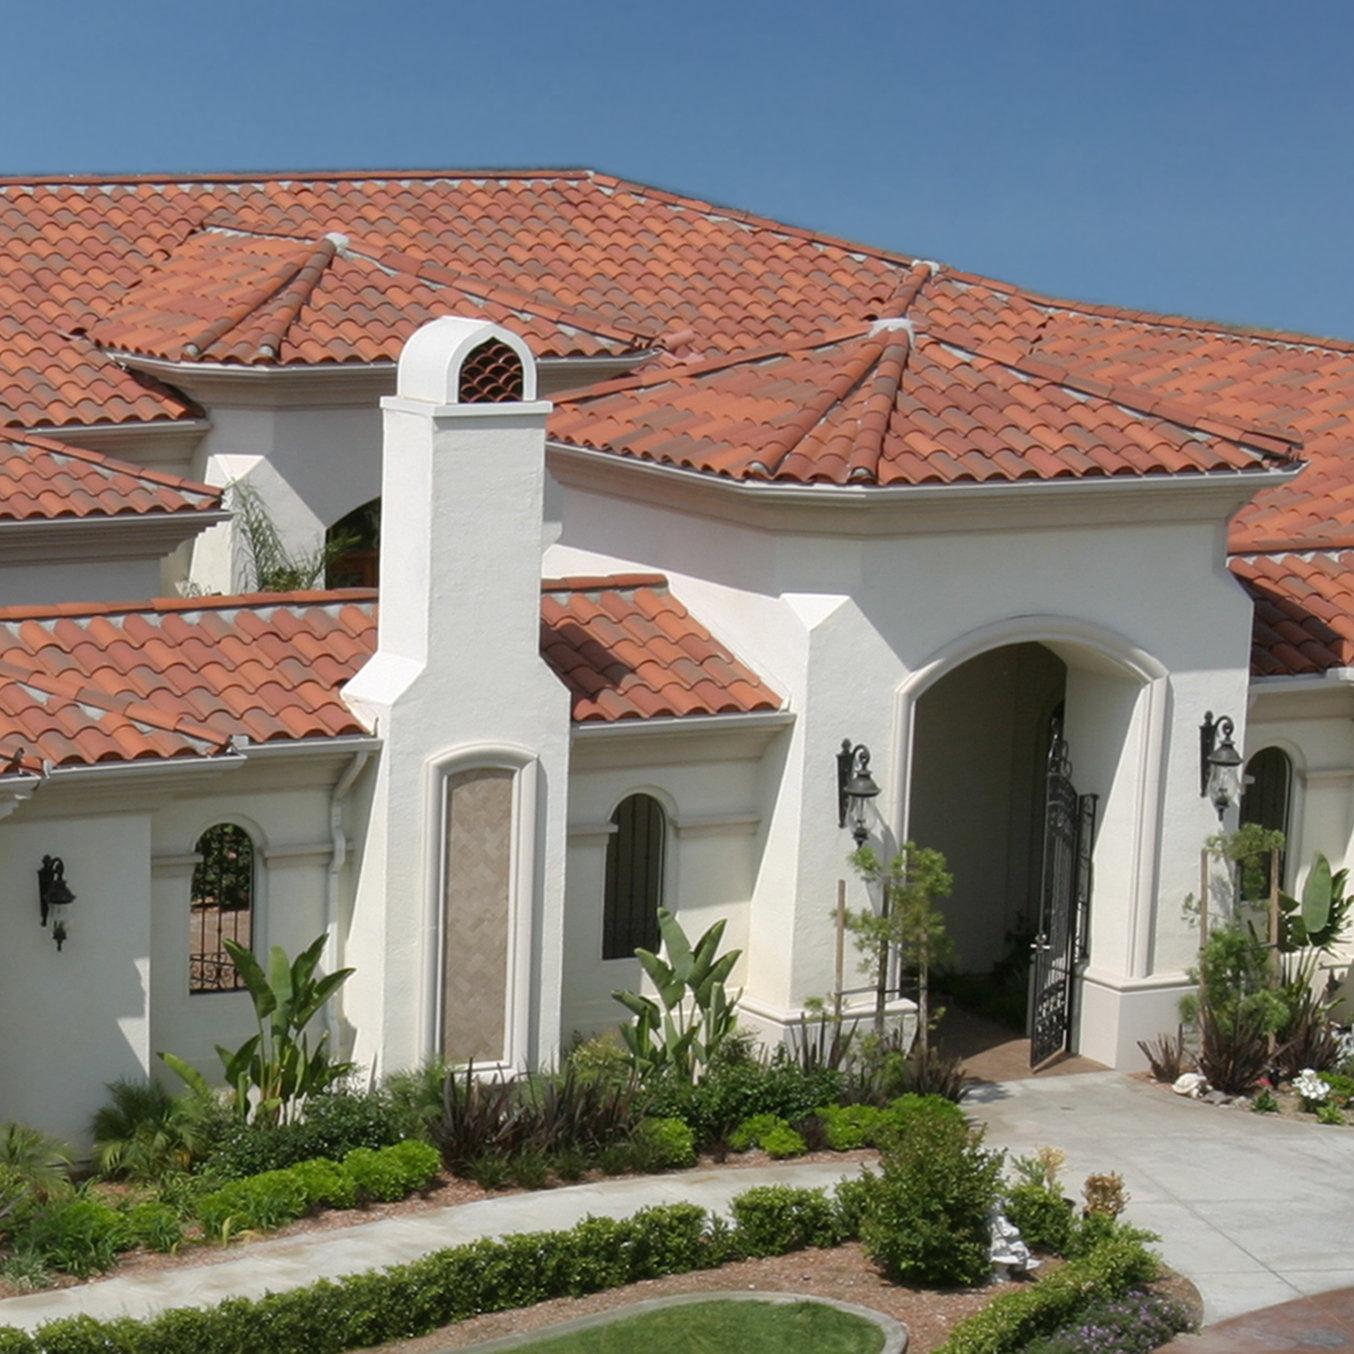 MCA Clay Roof Tile, Maruhachi Ceramics of America, Inc. (MCA) image   MCA Clay Roof Tile, Maruhachi Ceramics of America, Inc. (MCA)